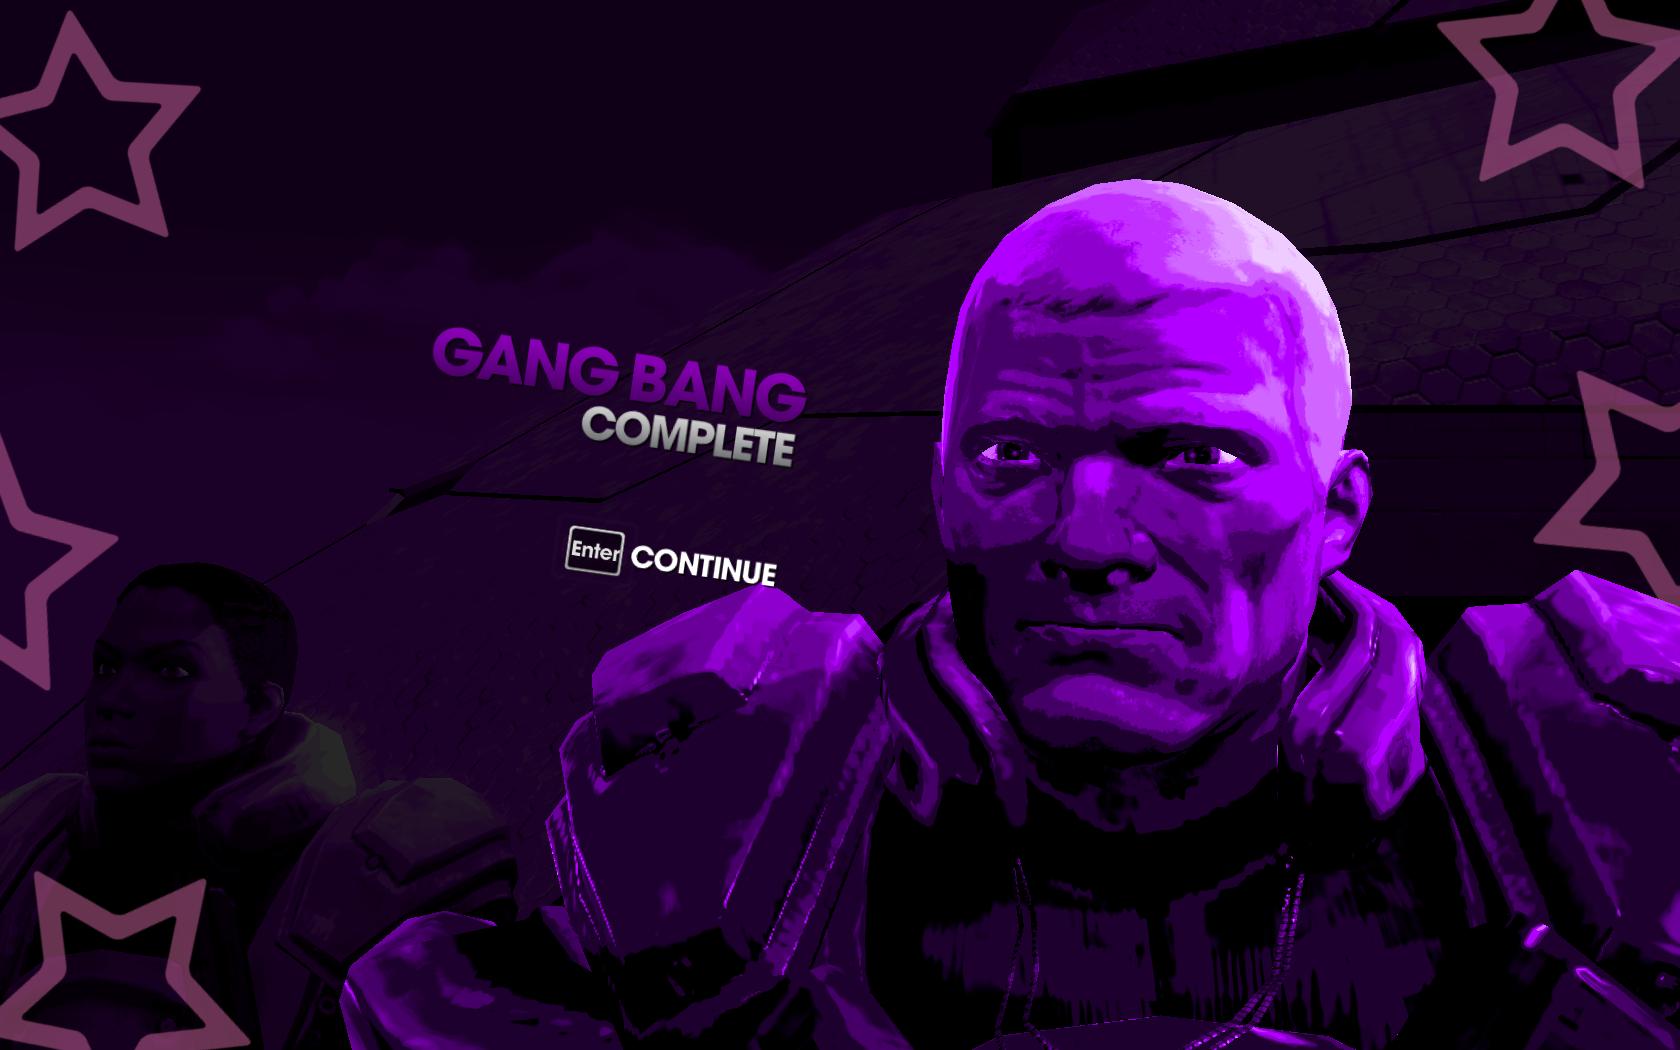 Gang Bang | Saints Row Wiki | FANDOM powered by Wikia